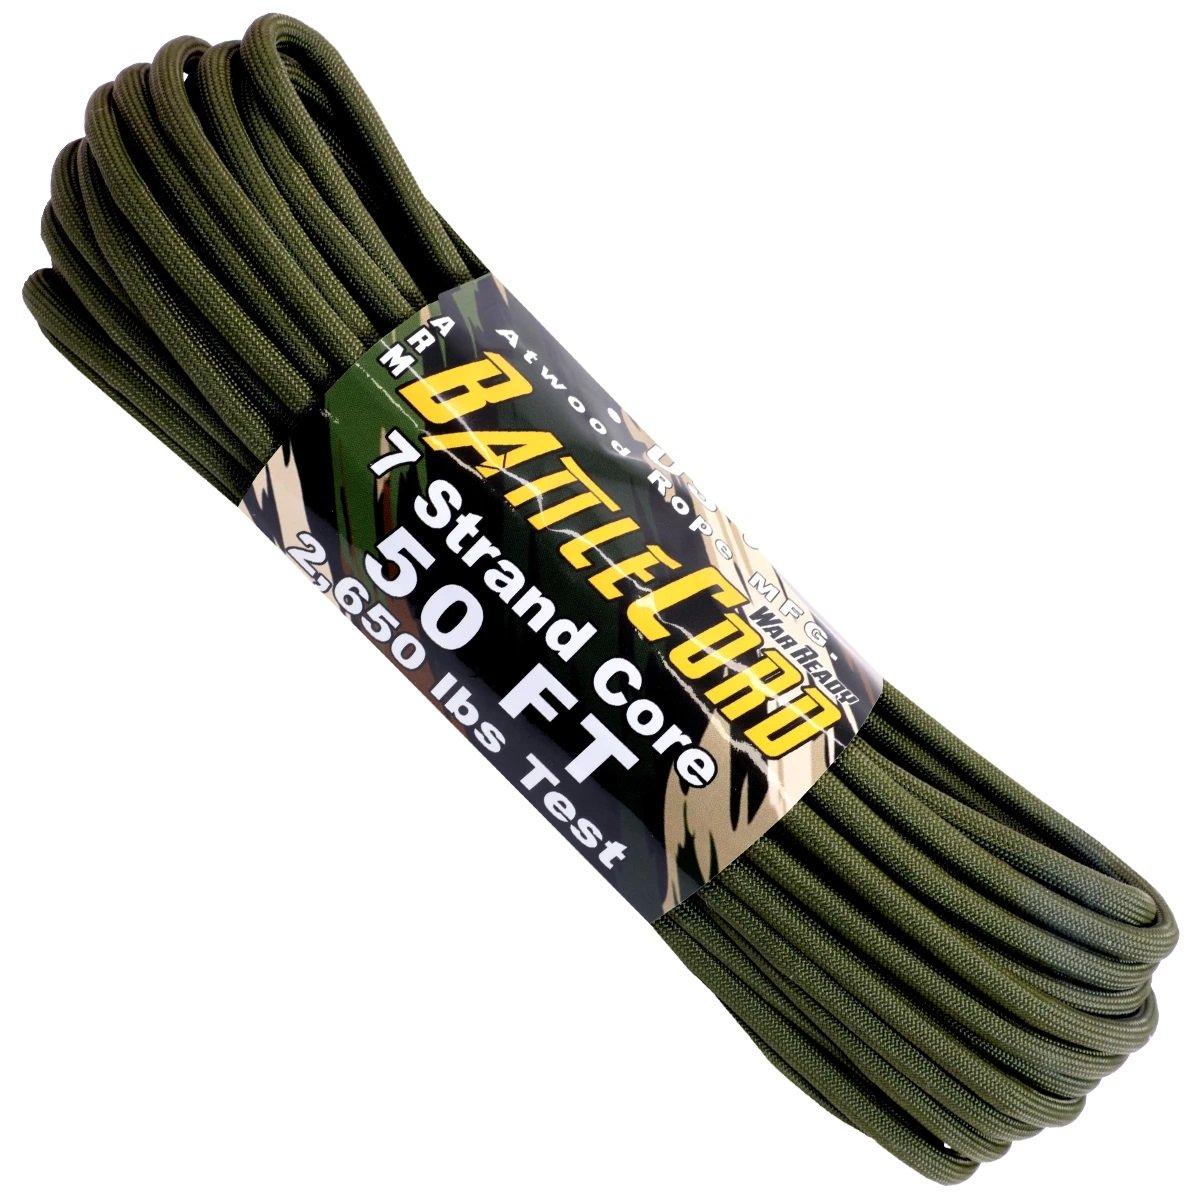 5.6mm Battle Cord – 100ft – Olive Drab